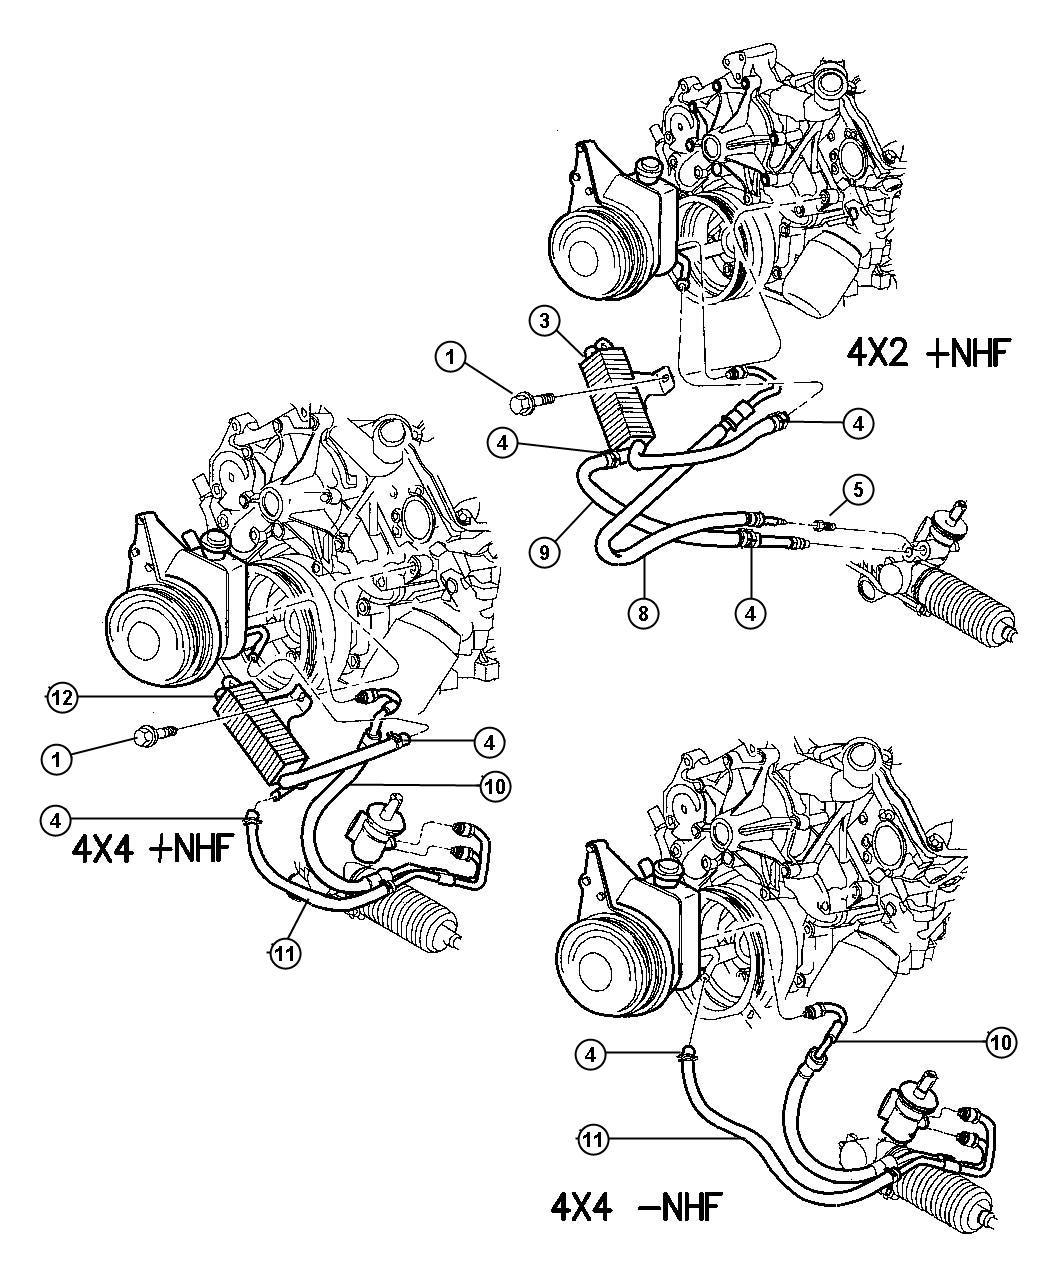 Dodge Durango Wiring Diagram For Egr